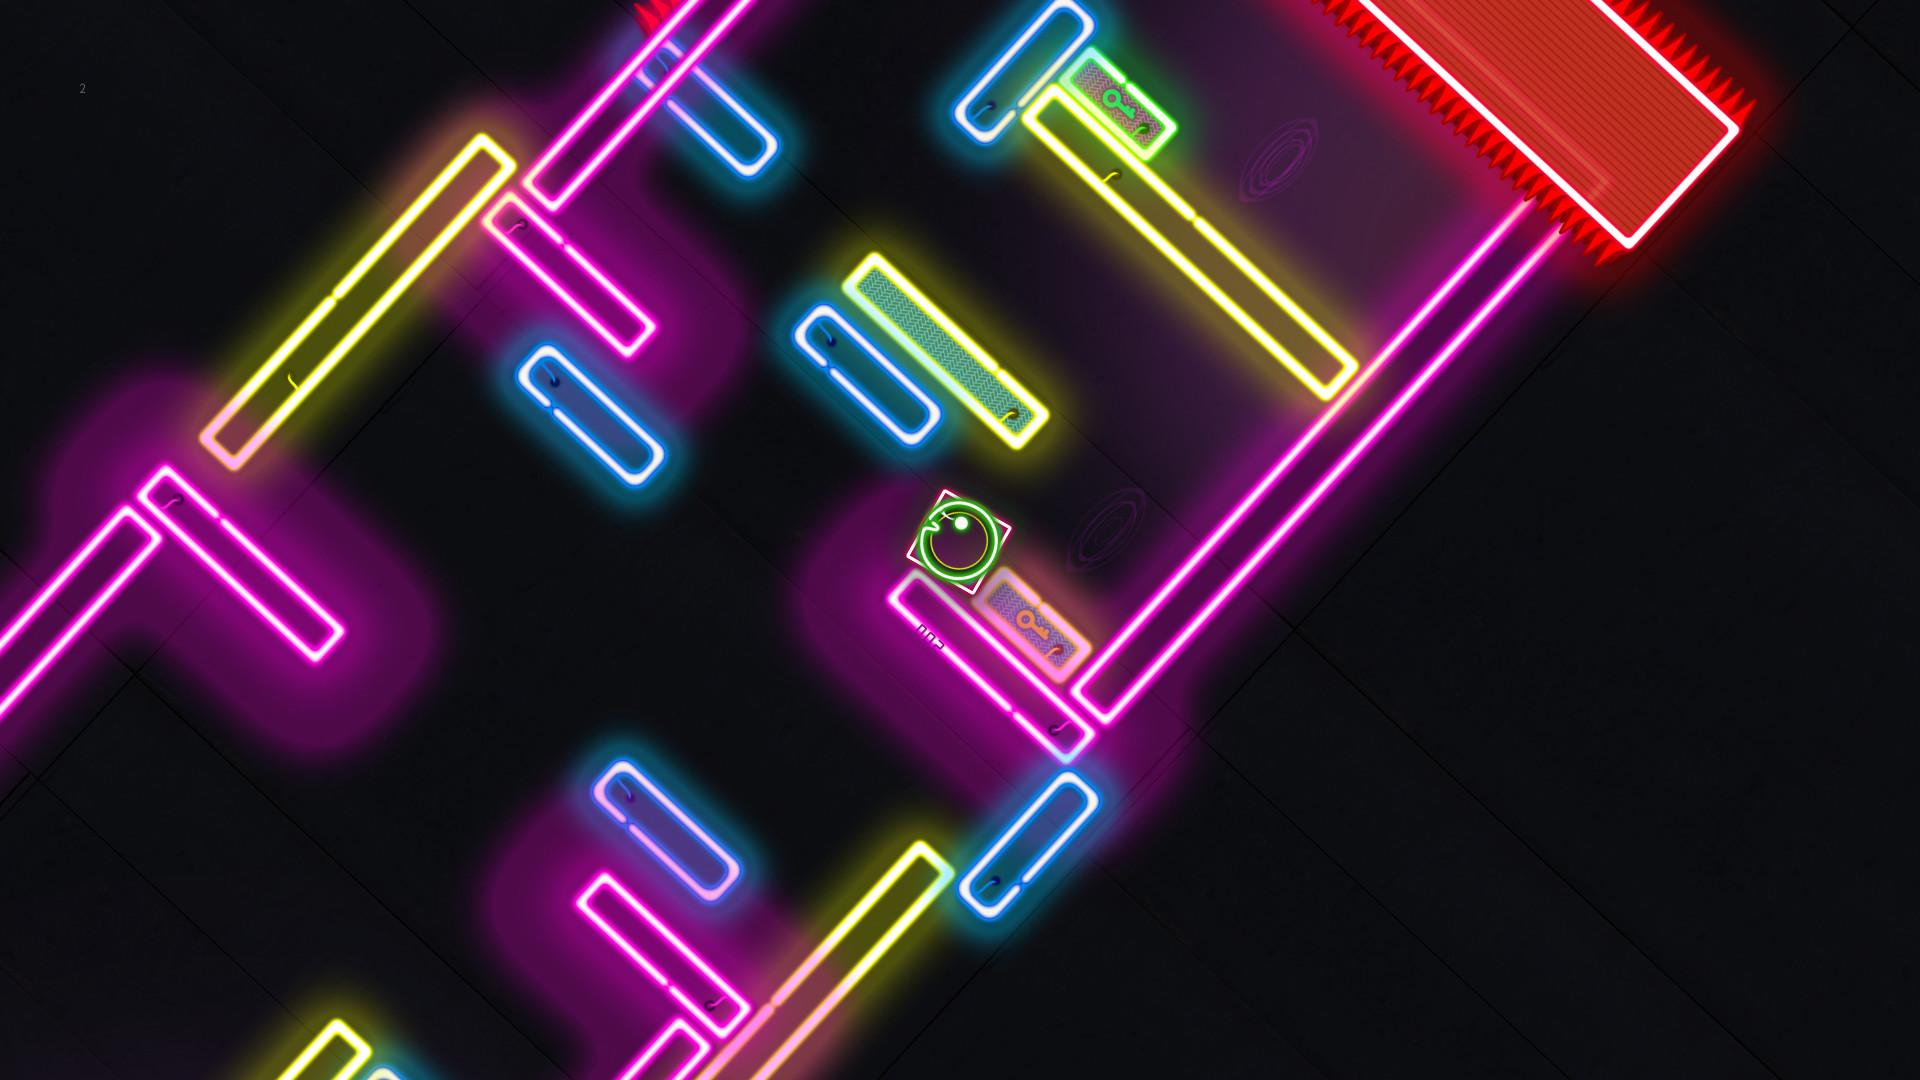 Neon screenshot